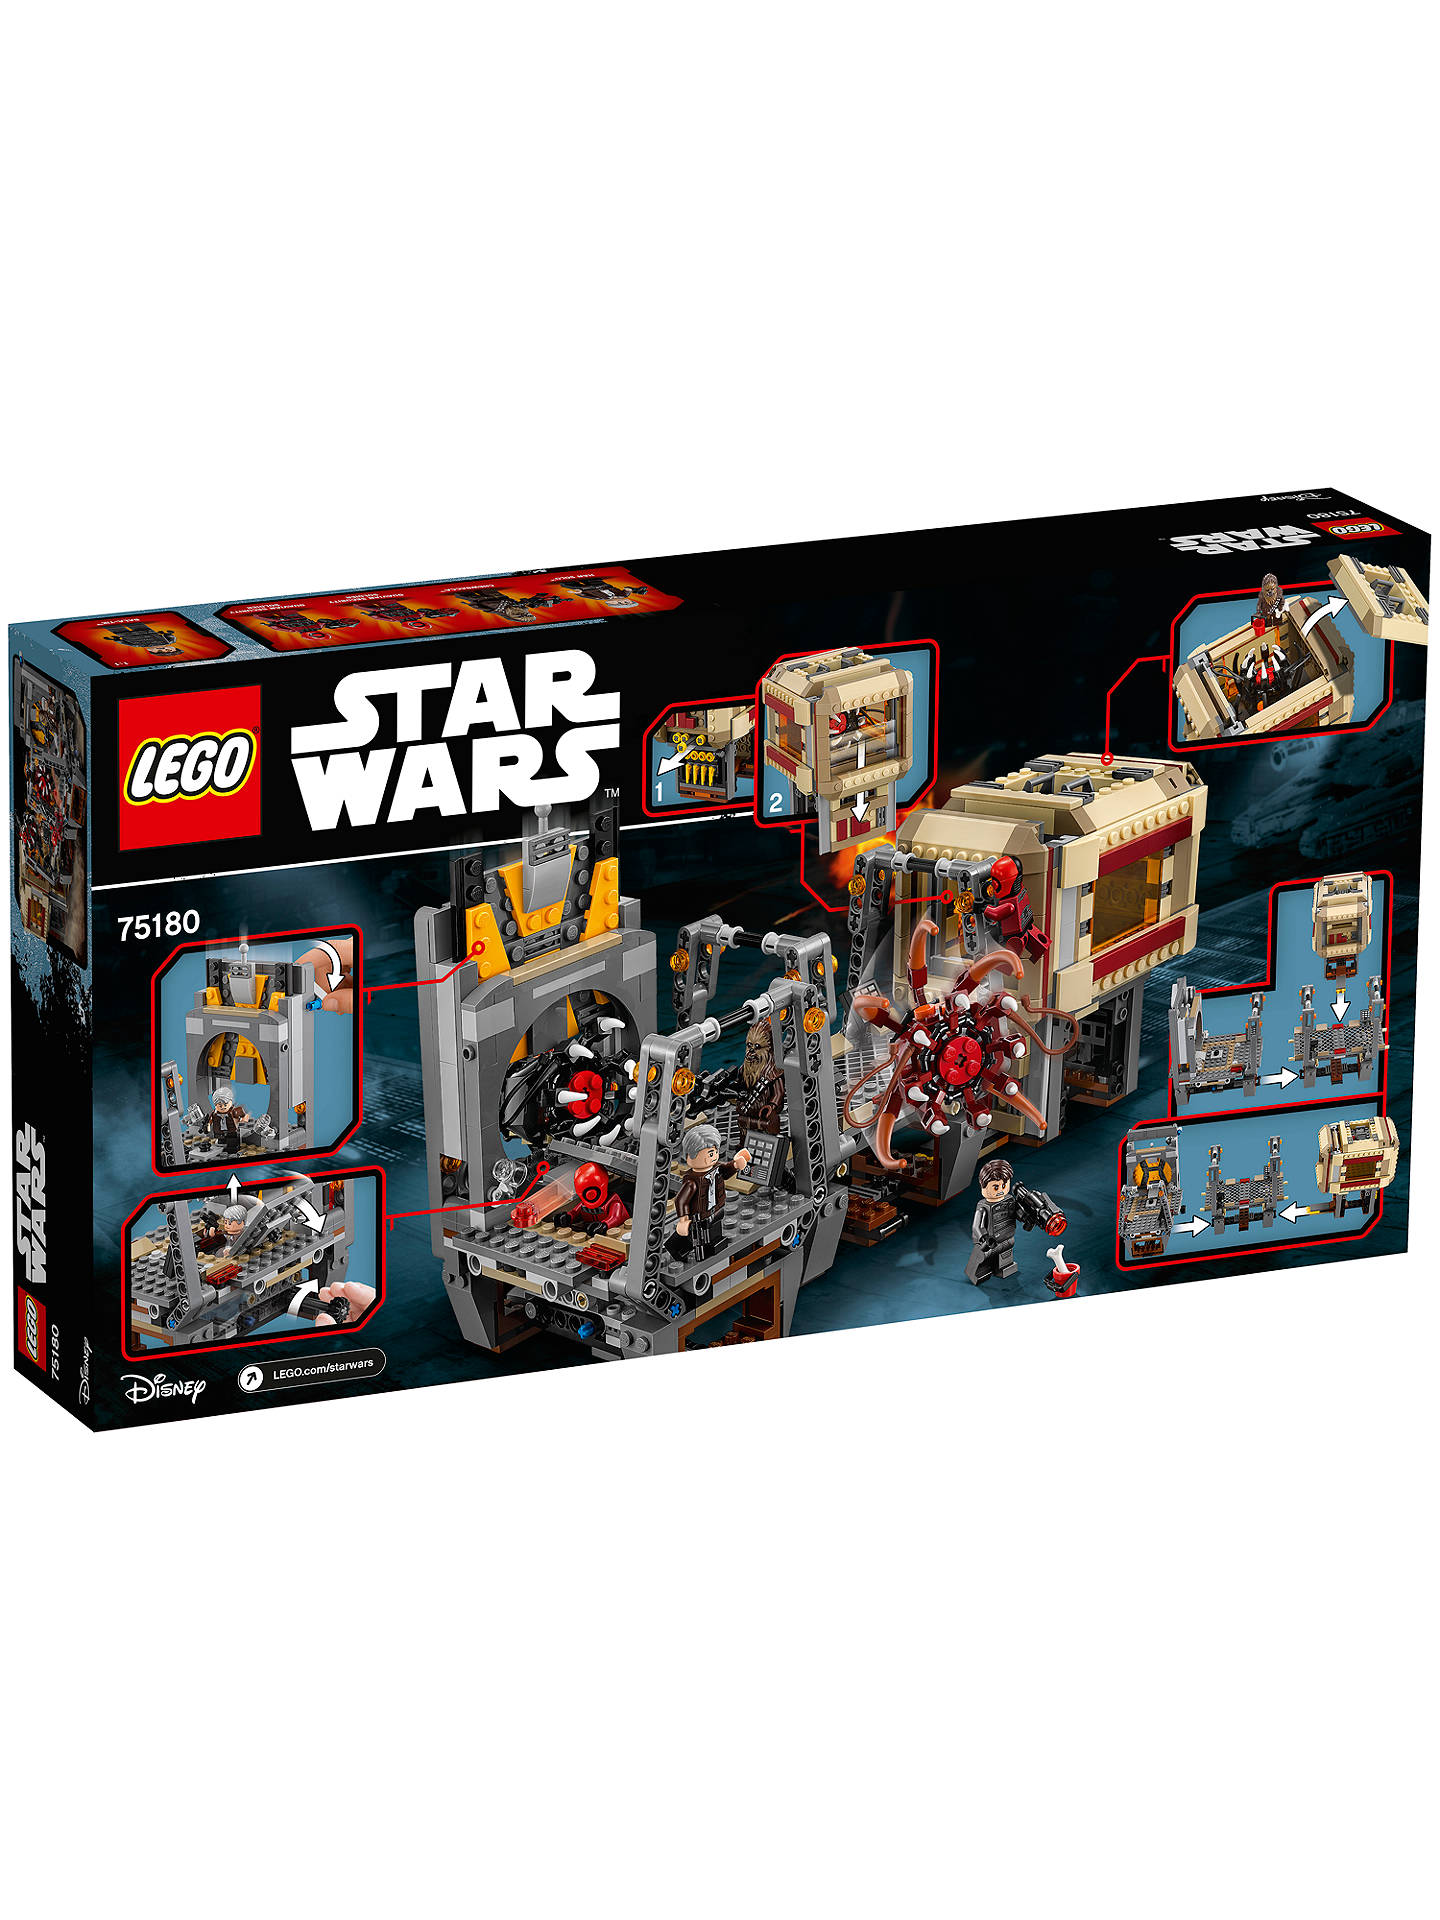 Lego Star Wars Rathtar Escape 75180 NEW